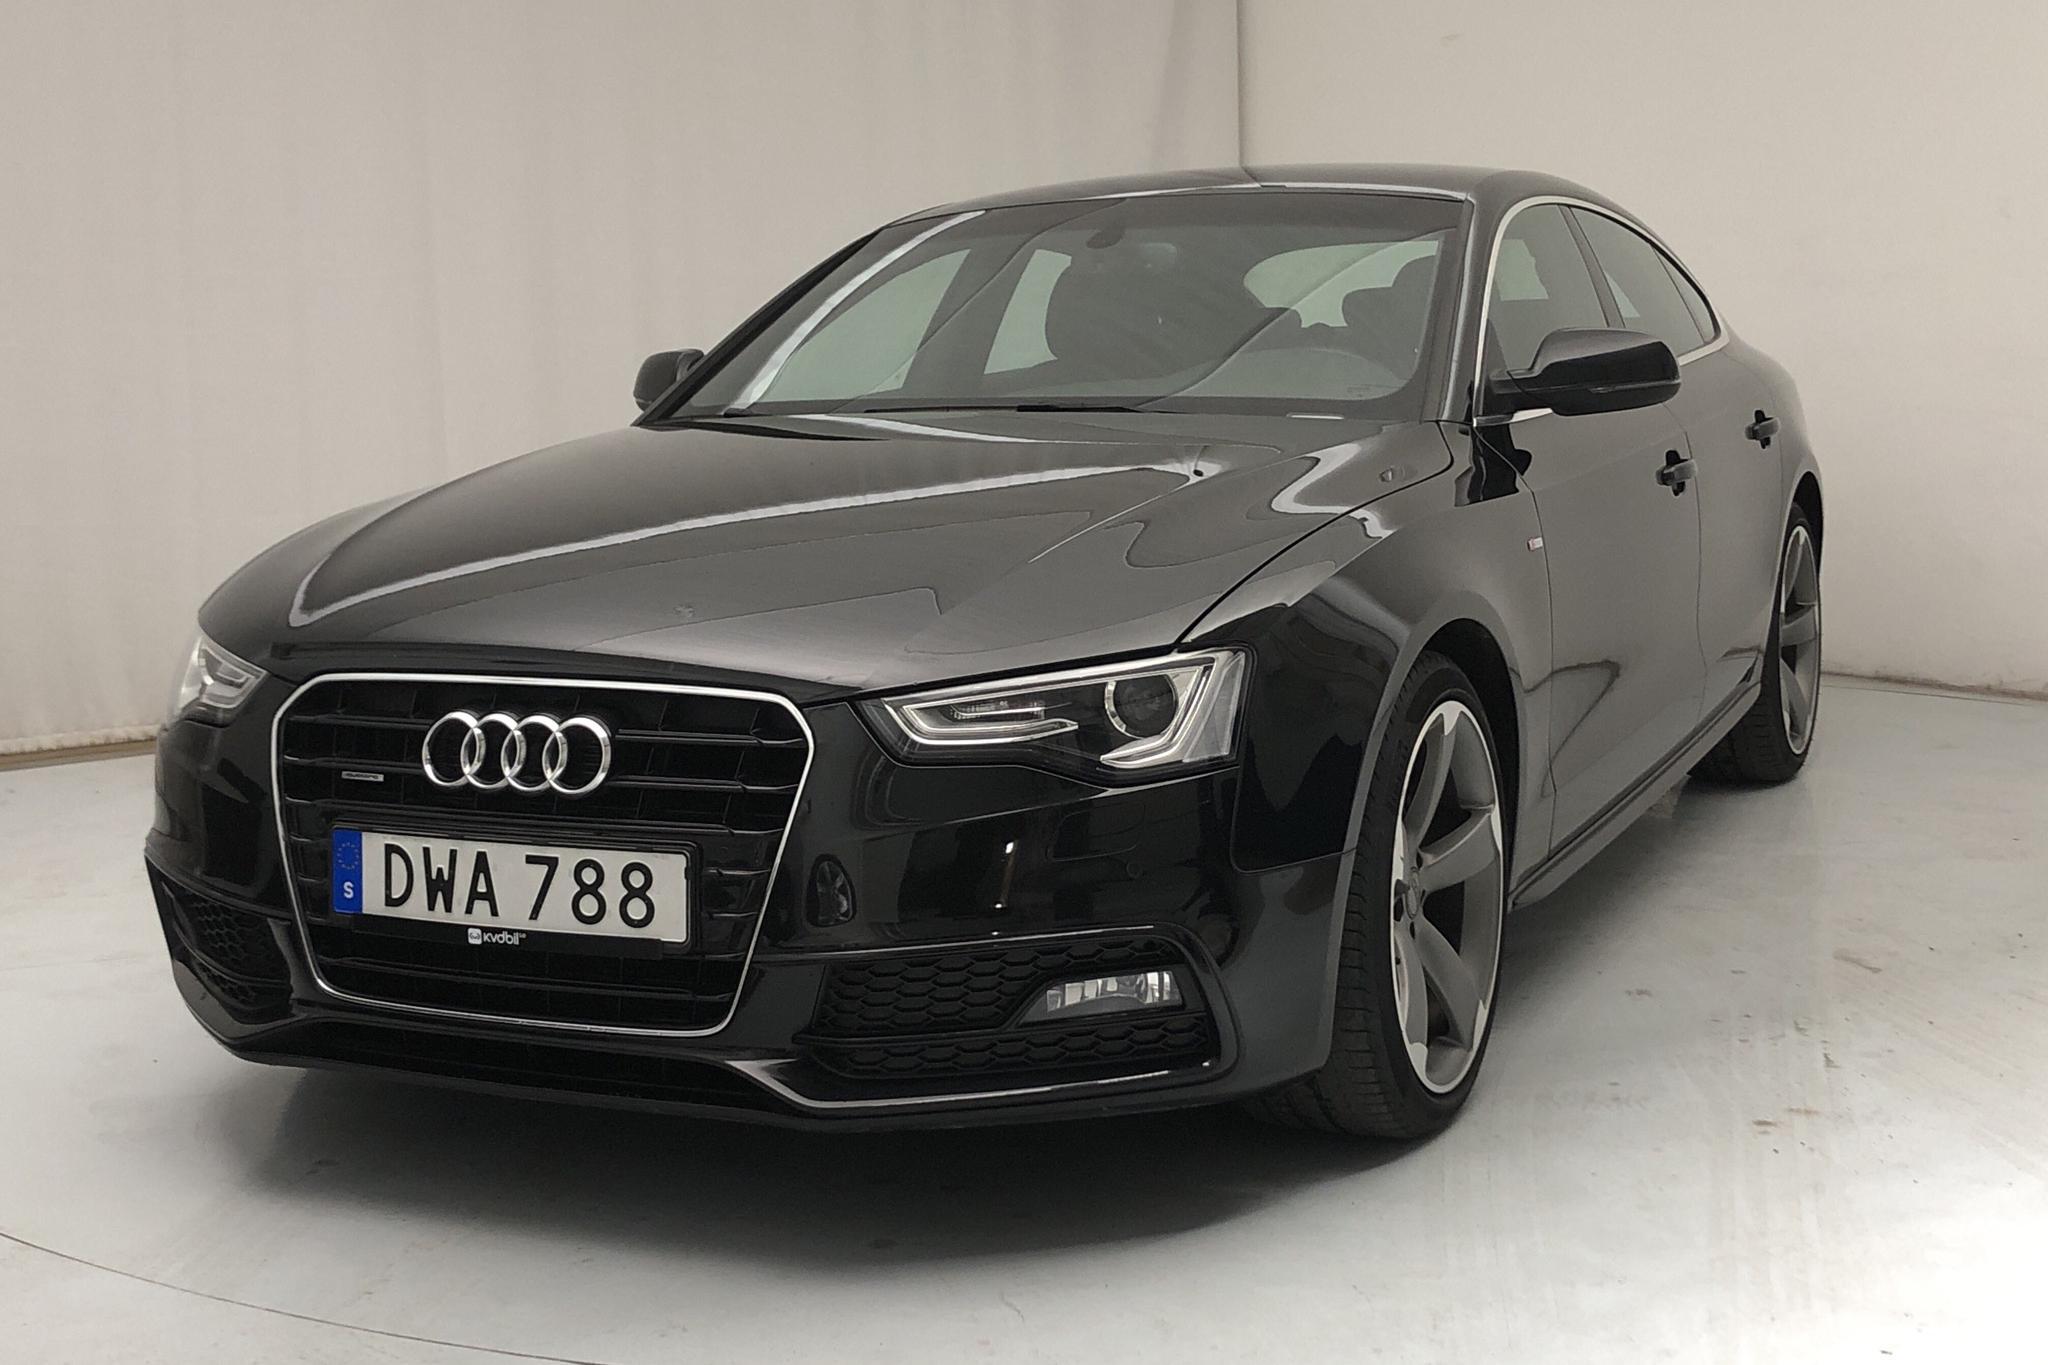 Audi A5 2.0 TDI Clean diesel Sportback quattro (190hk) - 38 140 km - Automatic - black - 2015